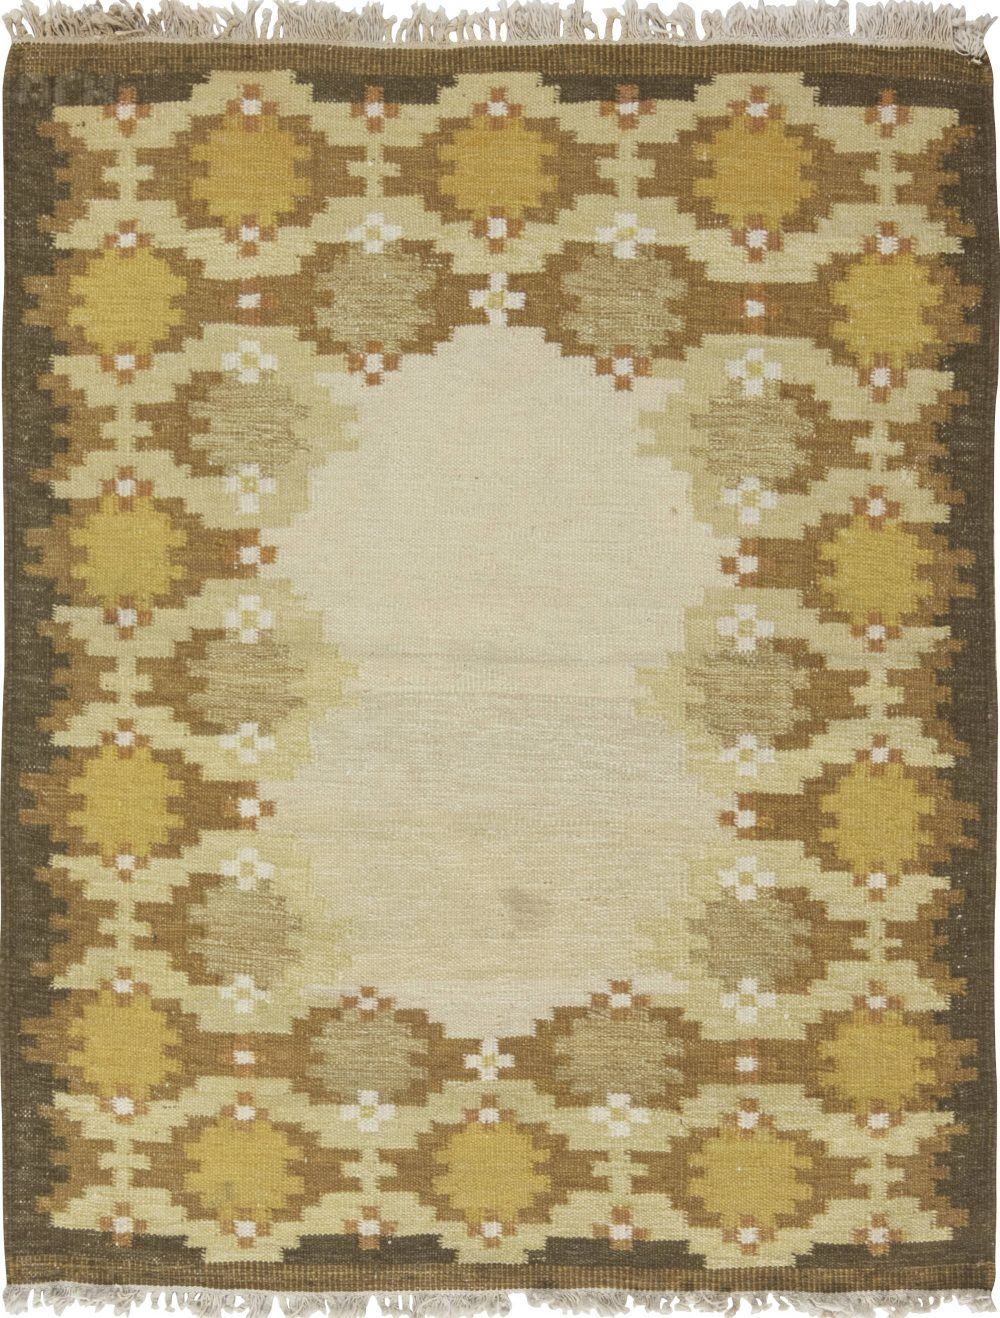 Midcentury Swedish Yellow, Beige and Brown Flat-Weave BB6570